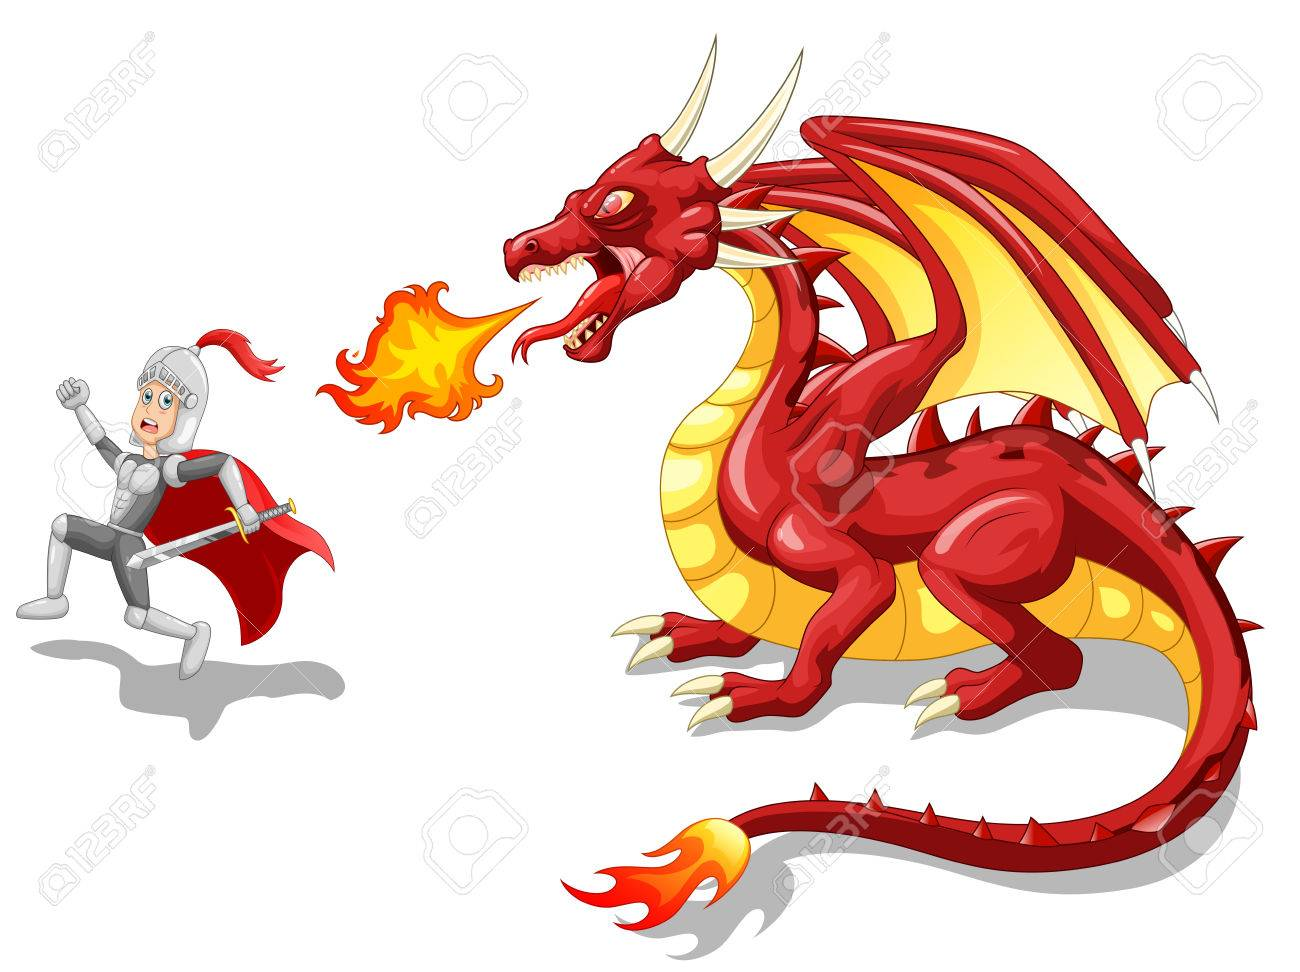 Cartoon knight with fierce dragon. Vector illustration.